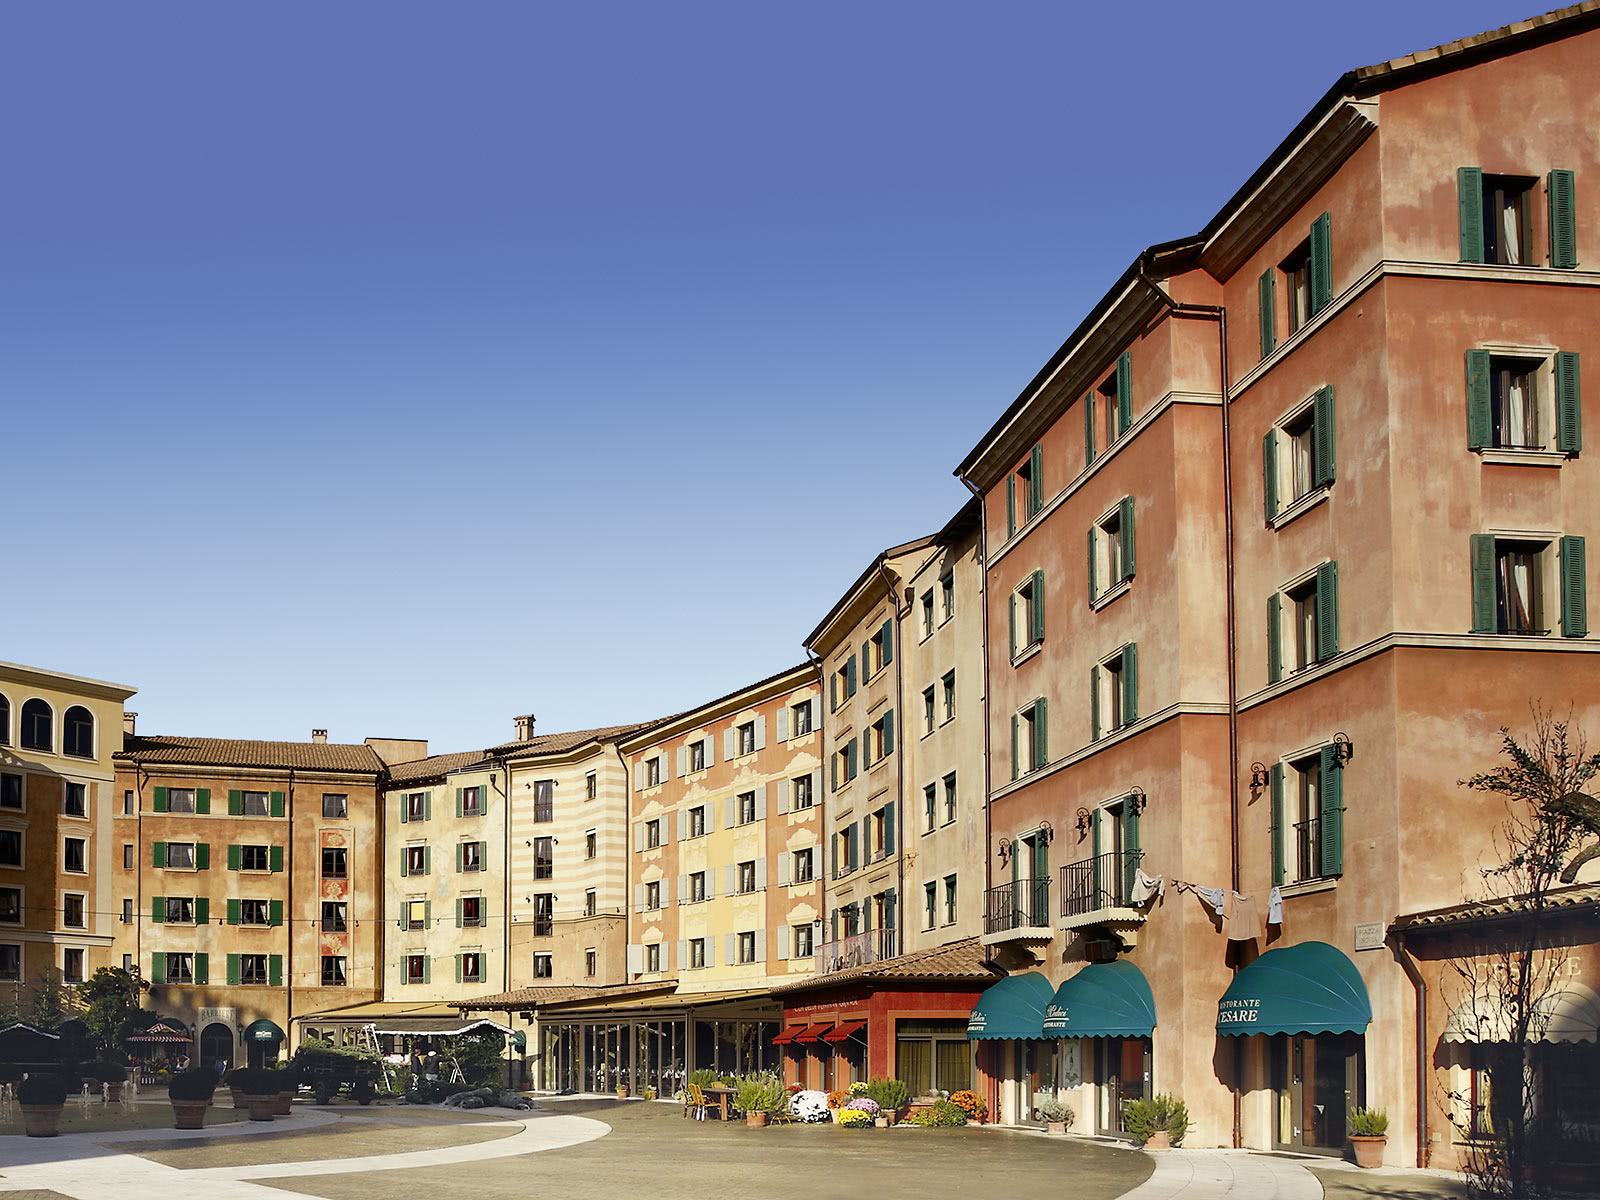 Referenzobjekt Ehret Hotel Colosseo Europapark Rust